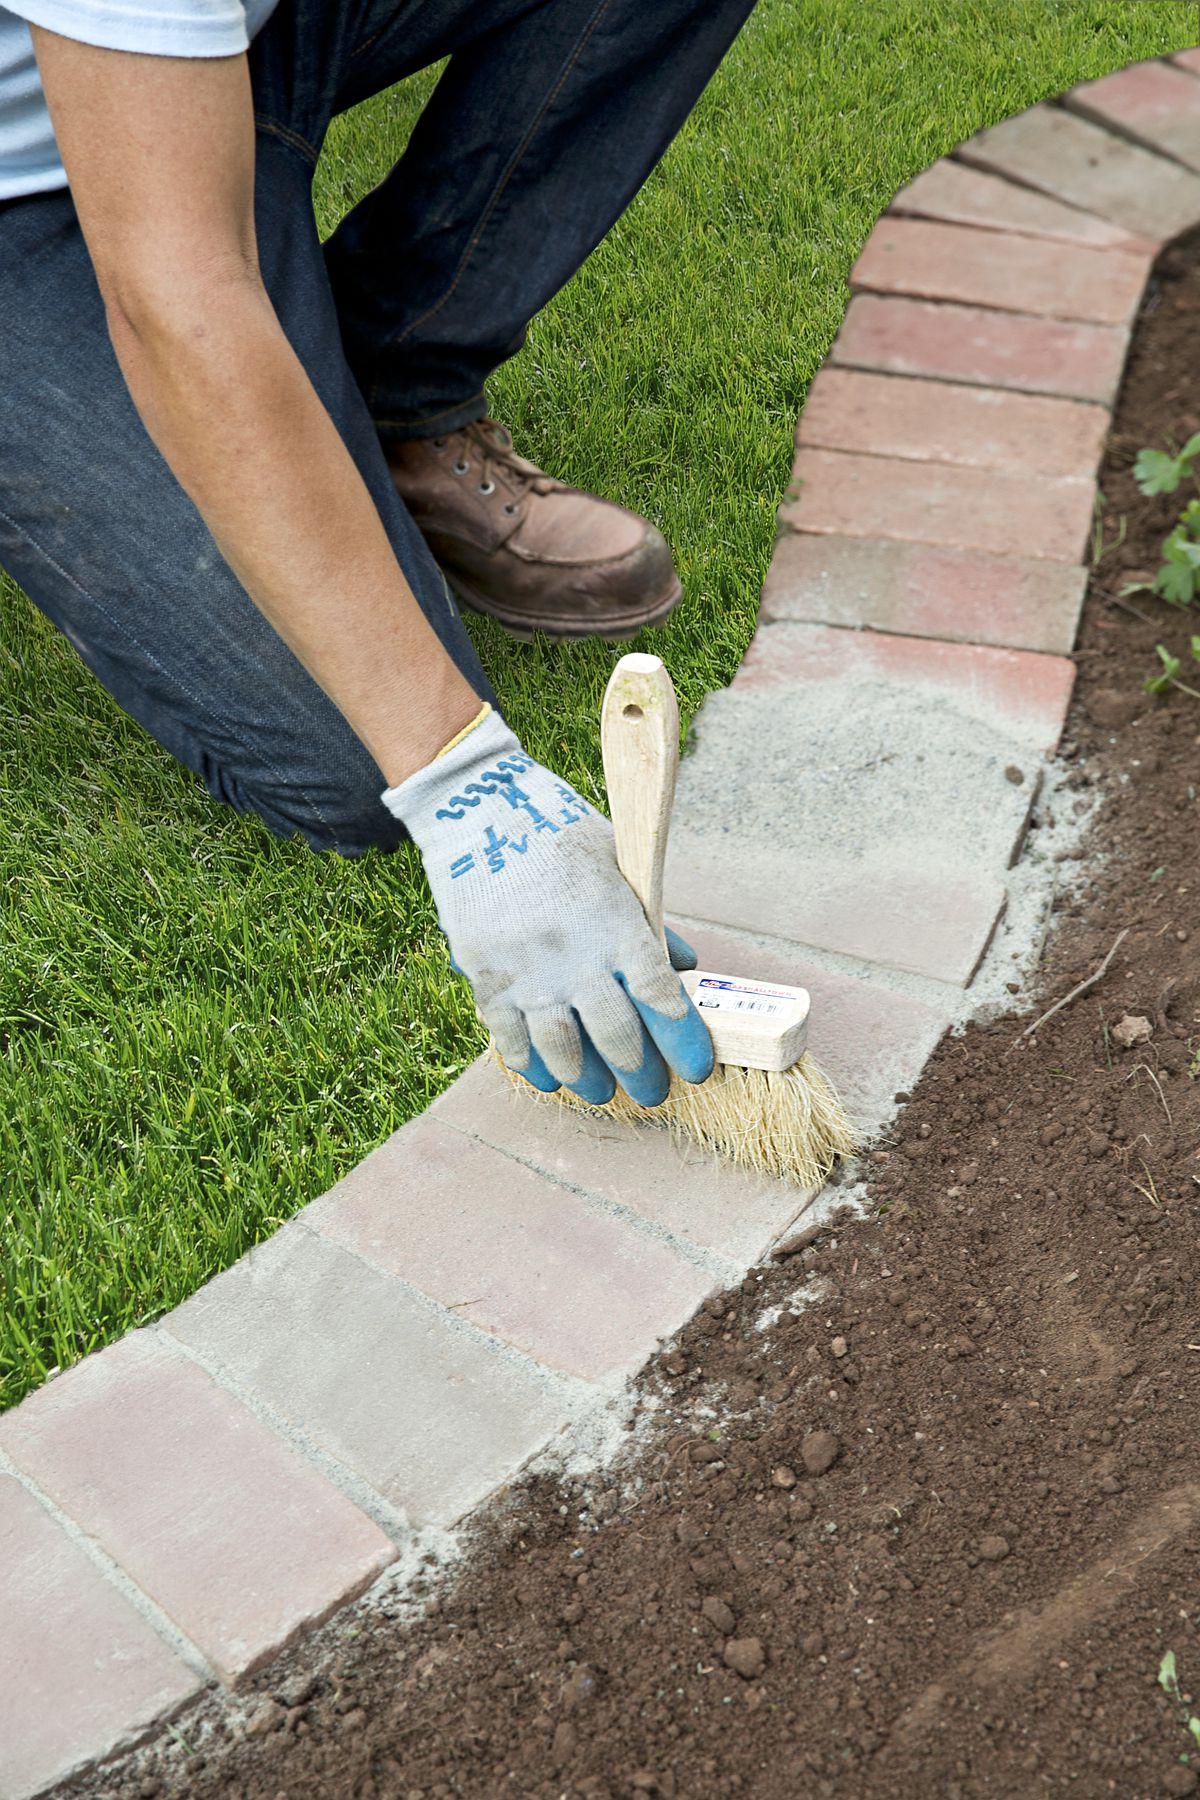 Man Fills Bricks With Polymeric Sand